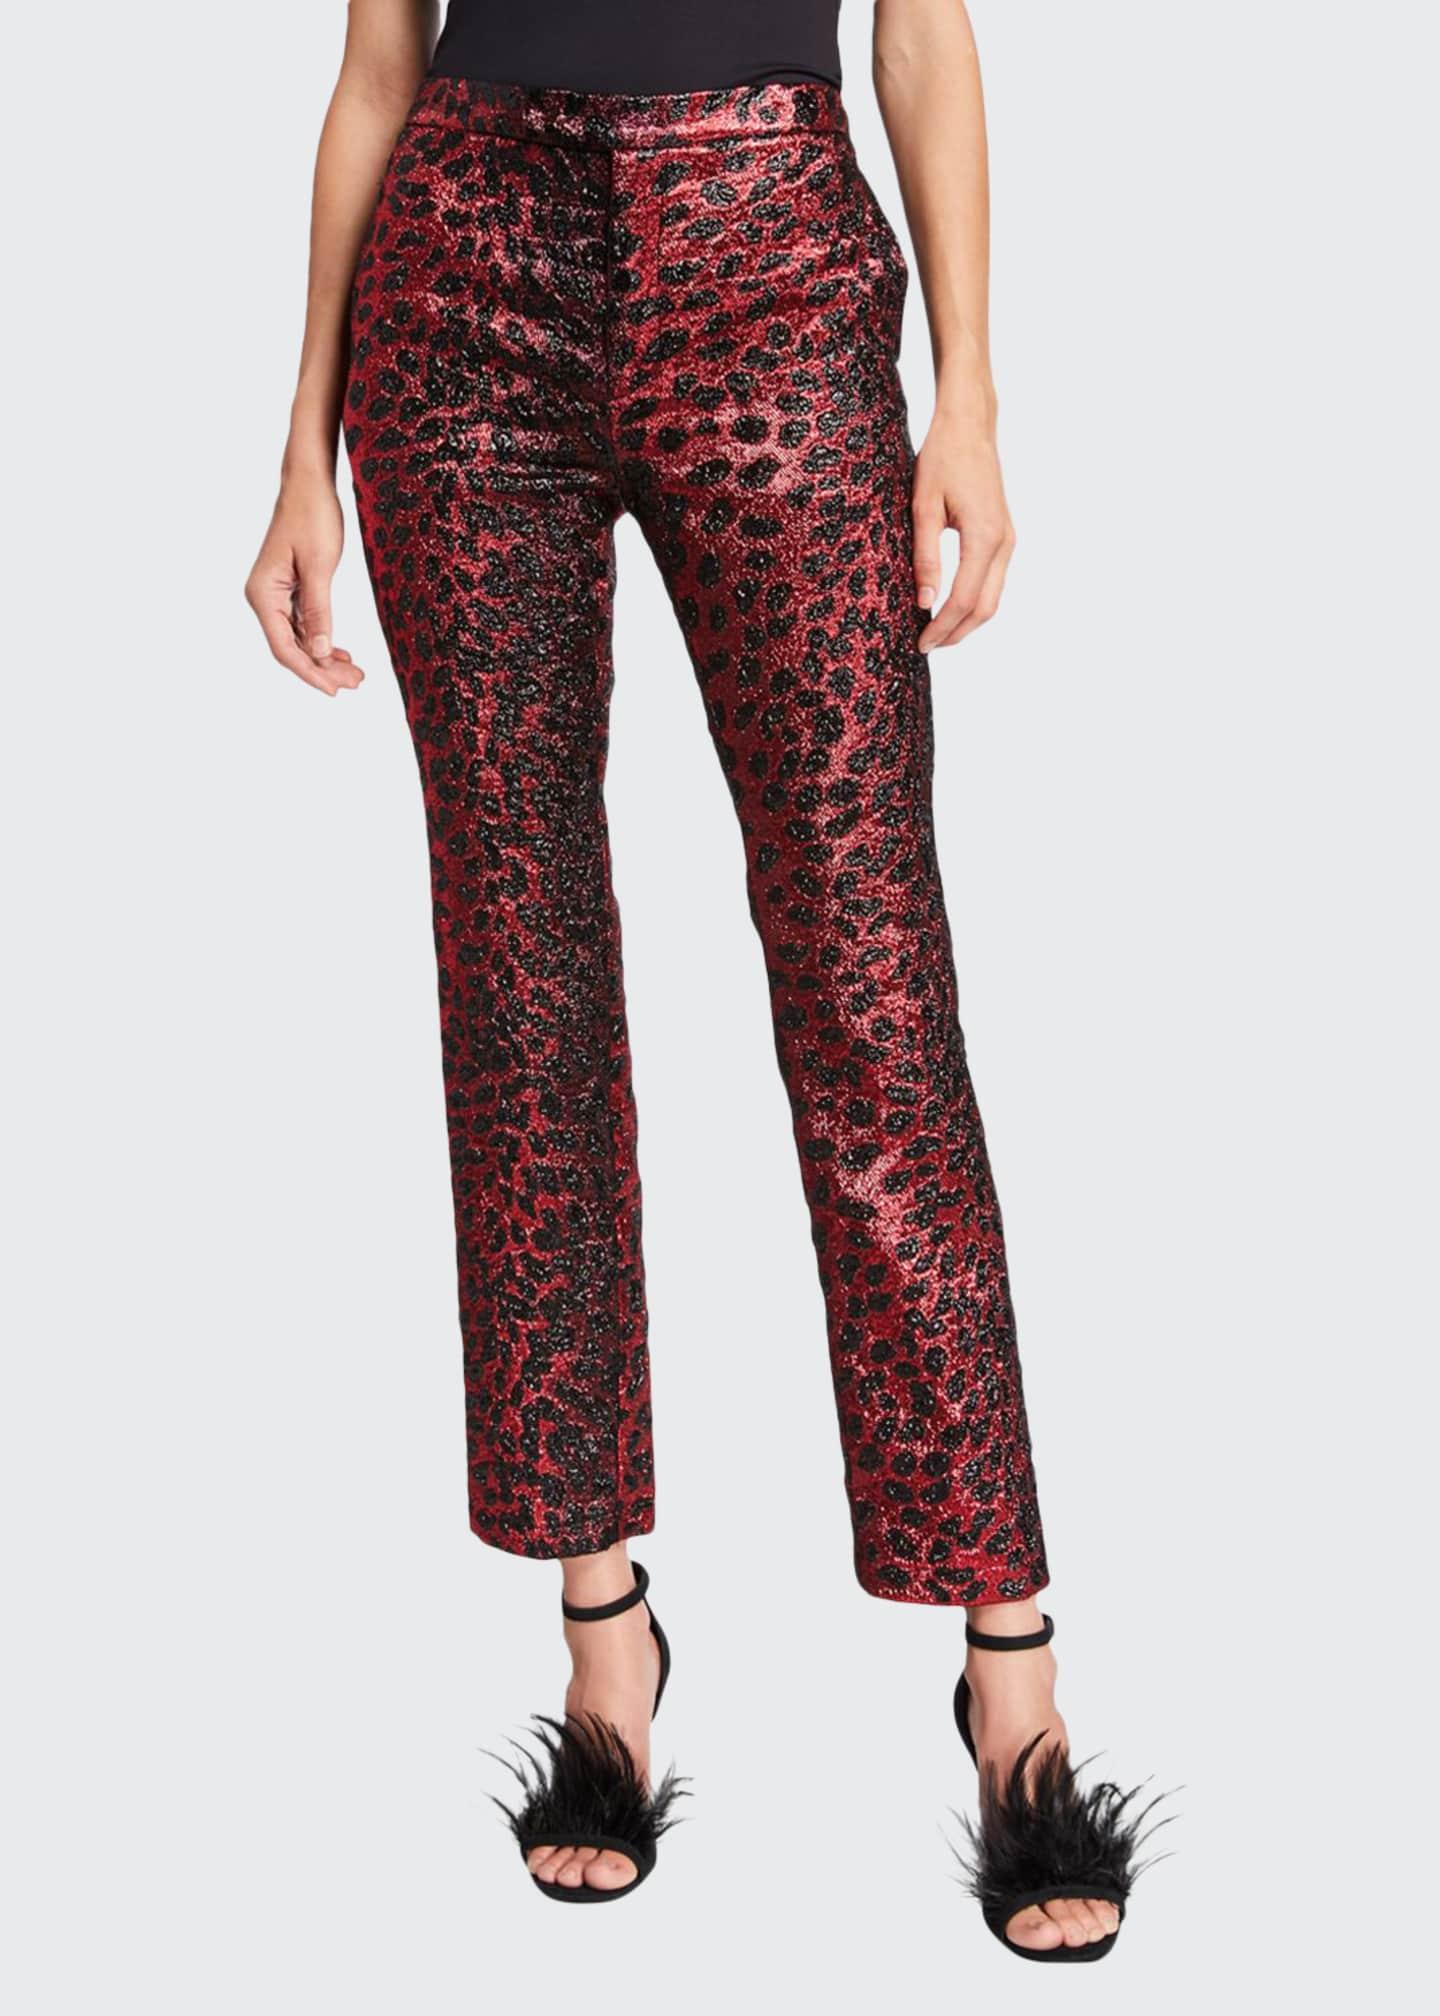 Libertine Metallic Cat Glittery Cheetah-Print Skinny-Leg Pants